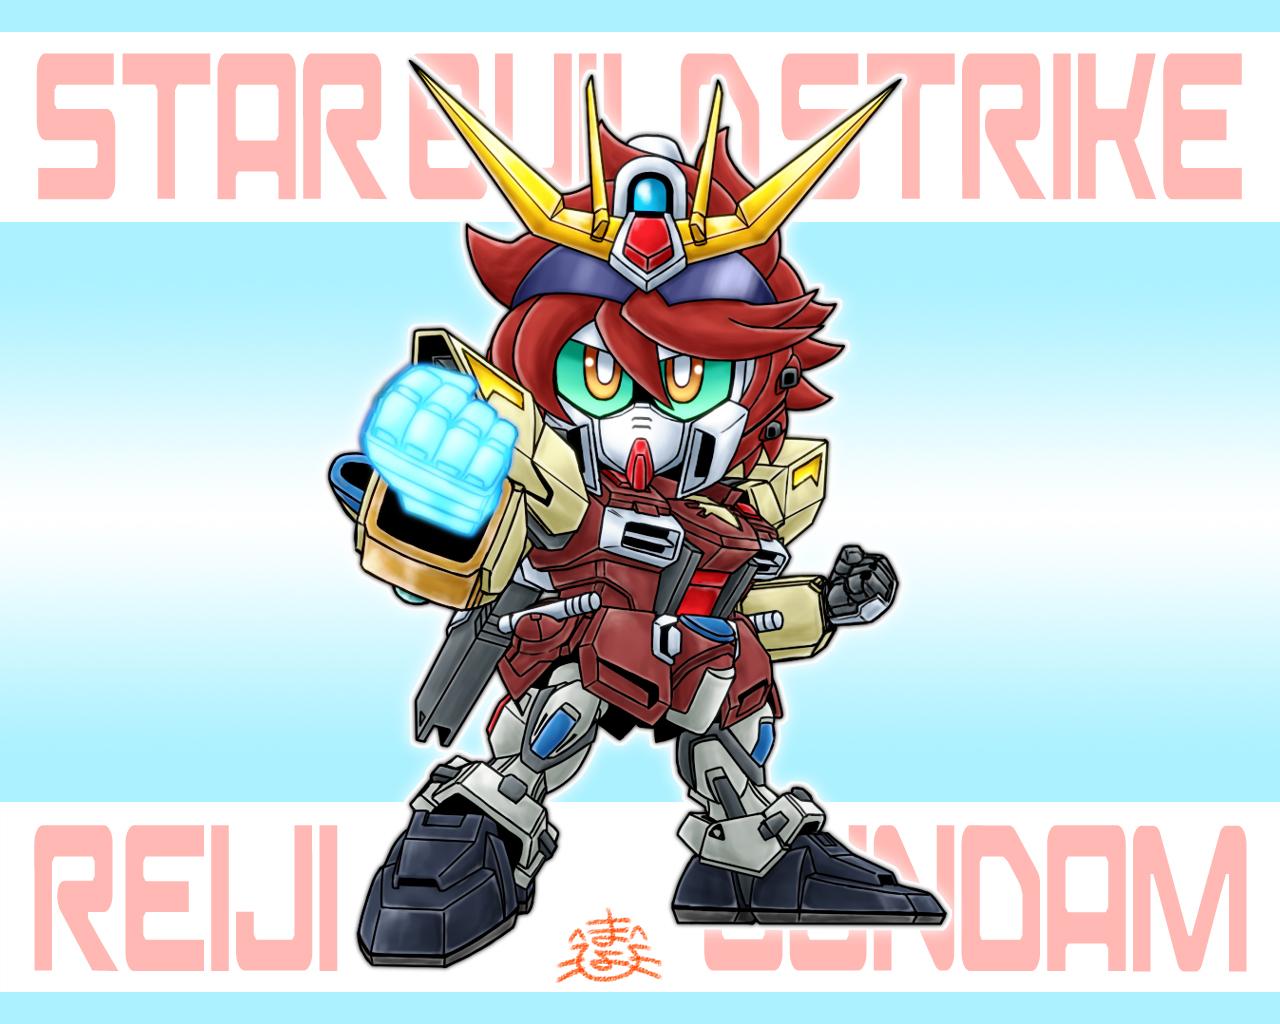 Reiji gundam build fighters image 1696763 zerochan for Domon in gundam build fighters